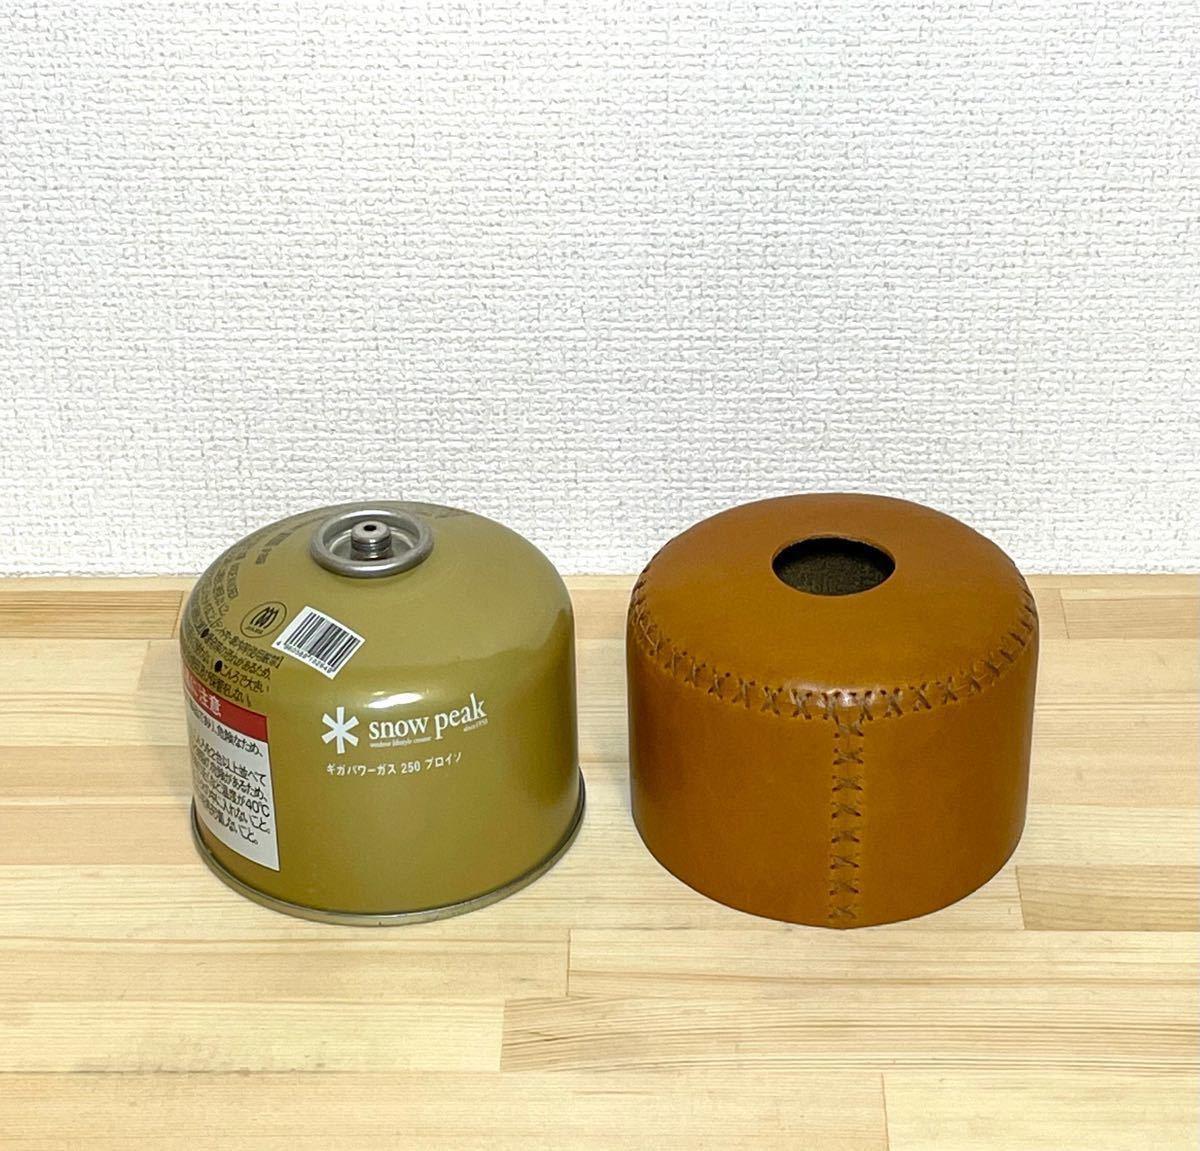 koo様注文品【ヌメ革】本革ガス缶カバー OD缶カバー レザーケース レザージャケット ノクターン ルミエール